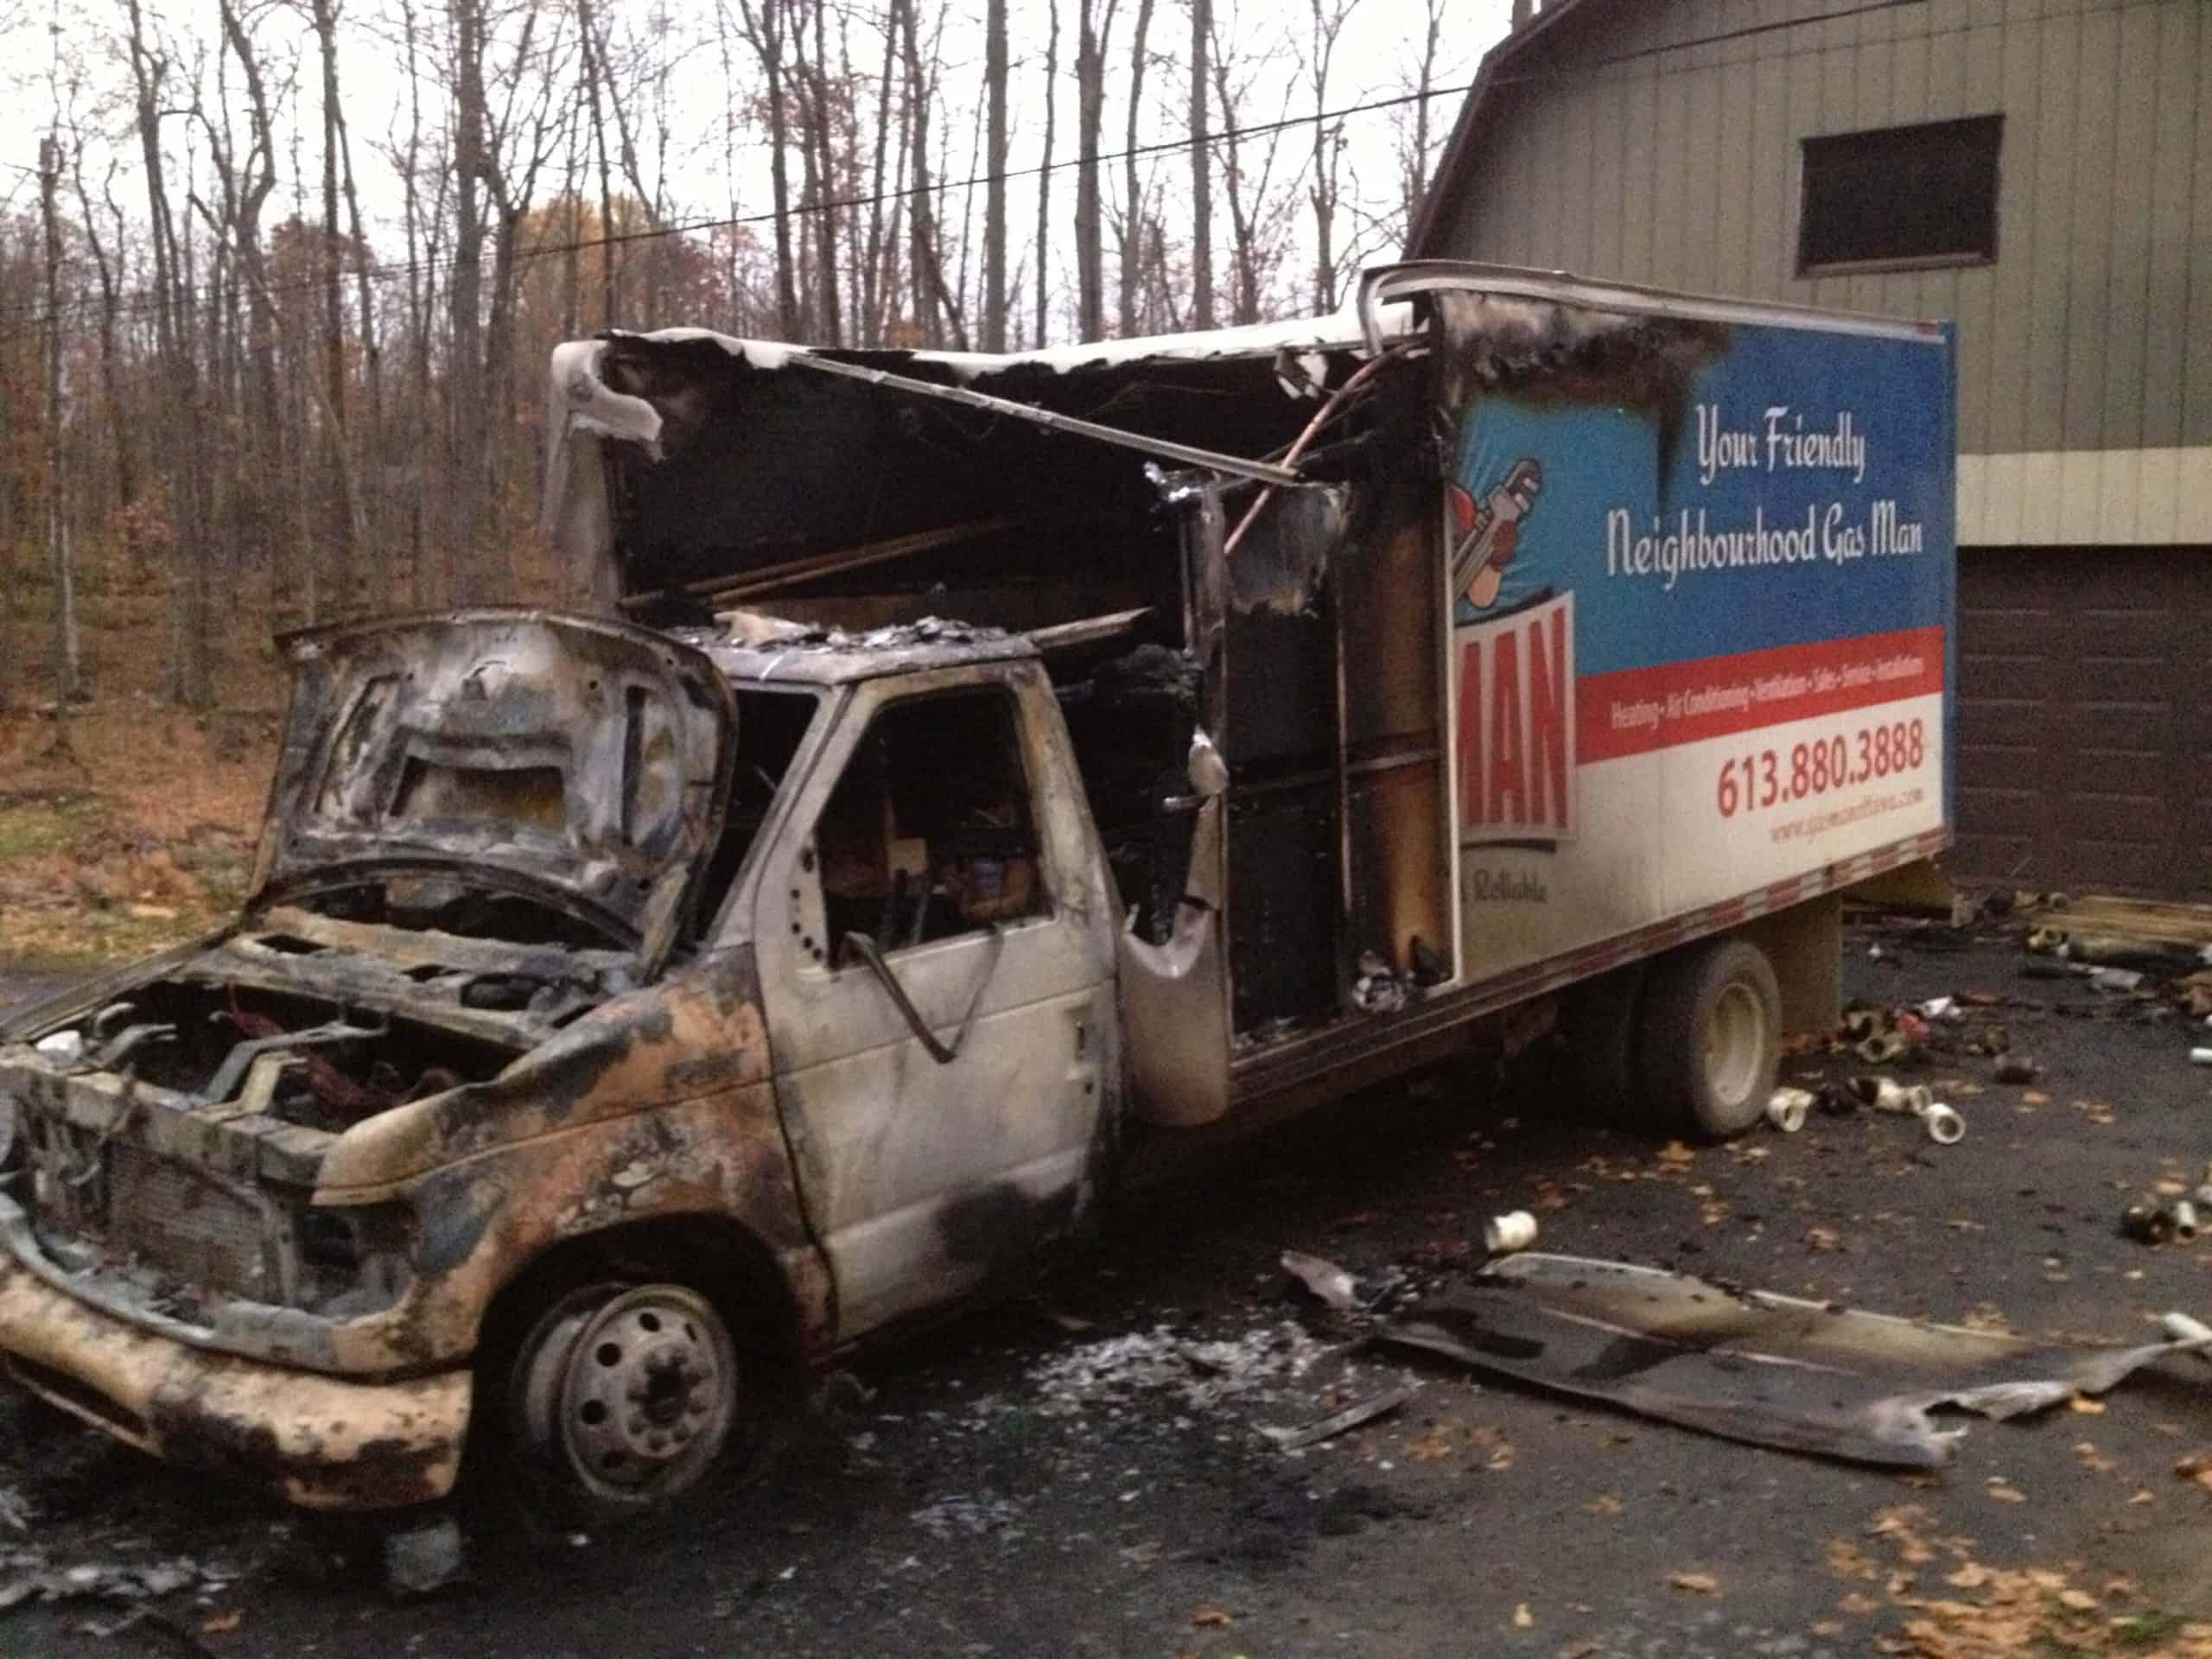 gasman truck after fire 404 error page